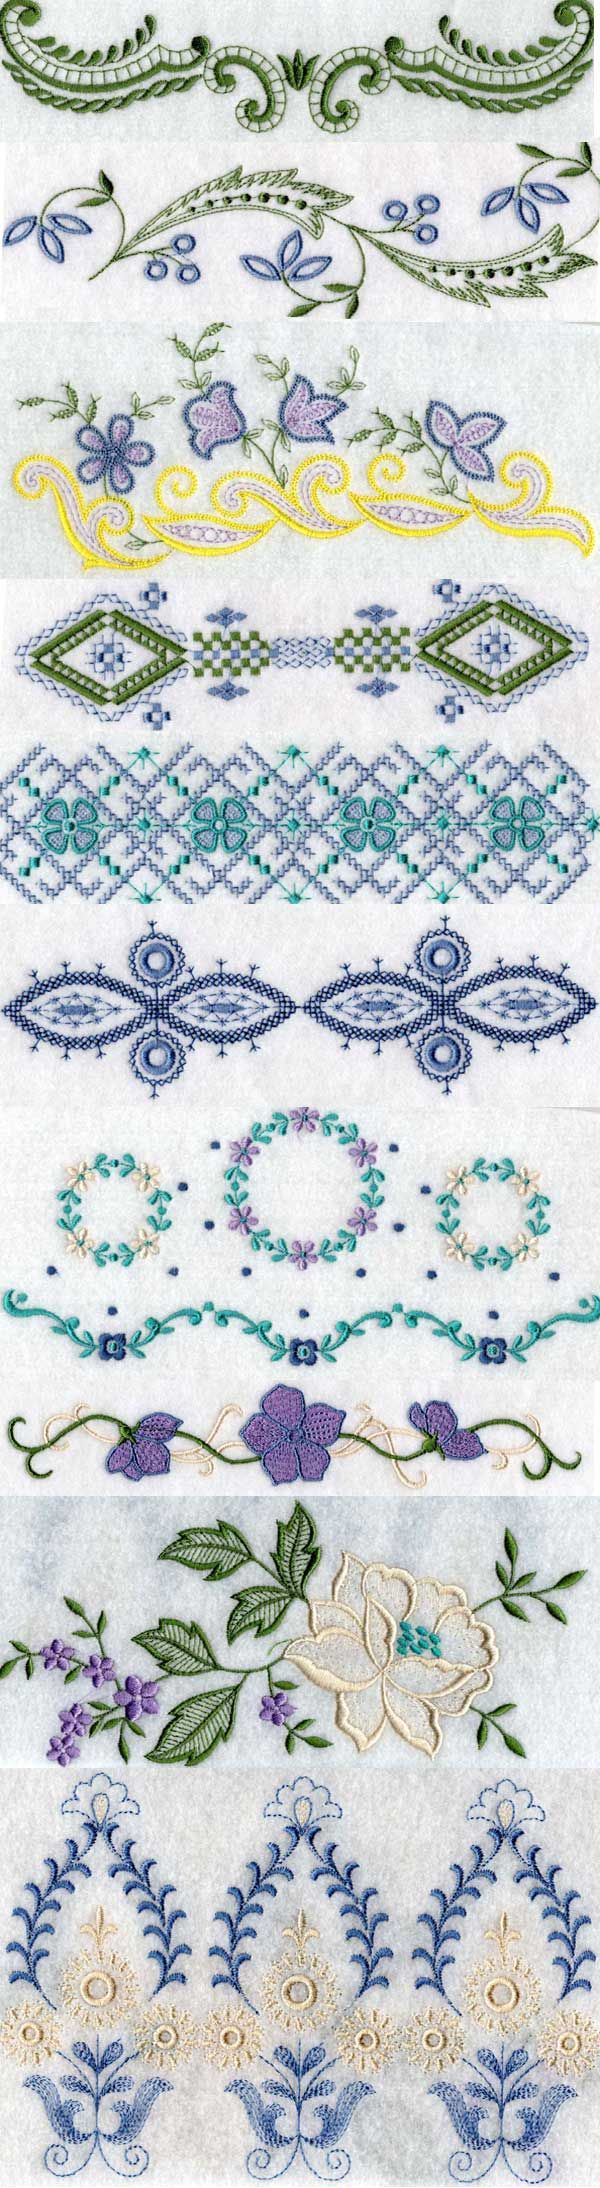 Linens 1 Embroidery Machine Design Details